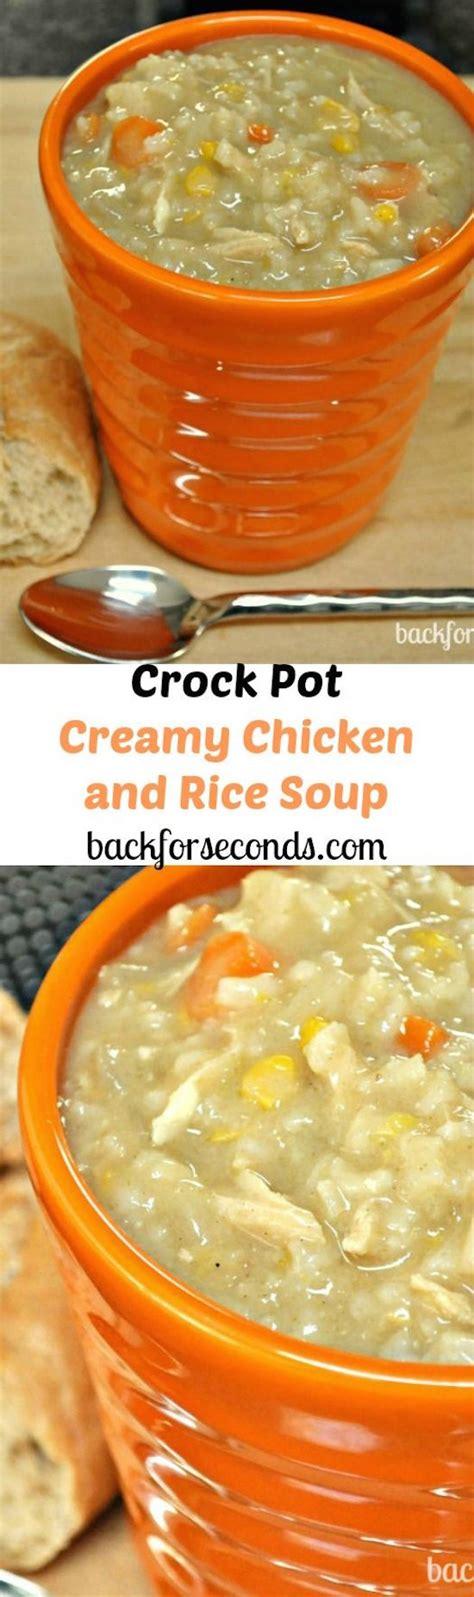 easy crockpot soup recipes crock pot and slow cooker soup recipes